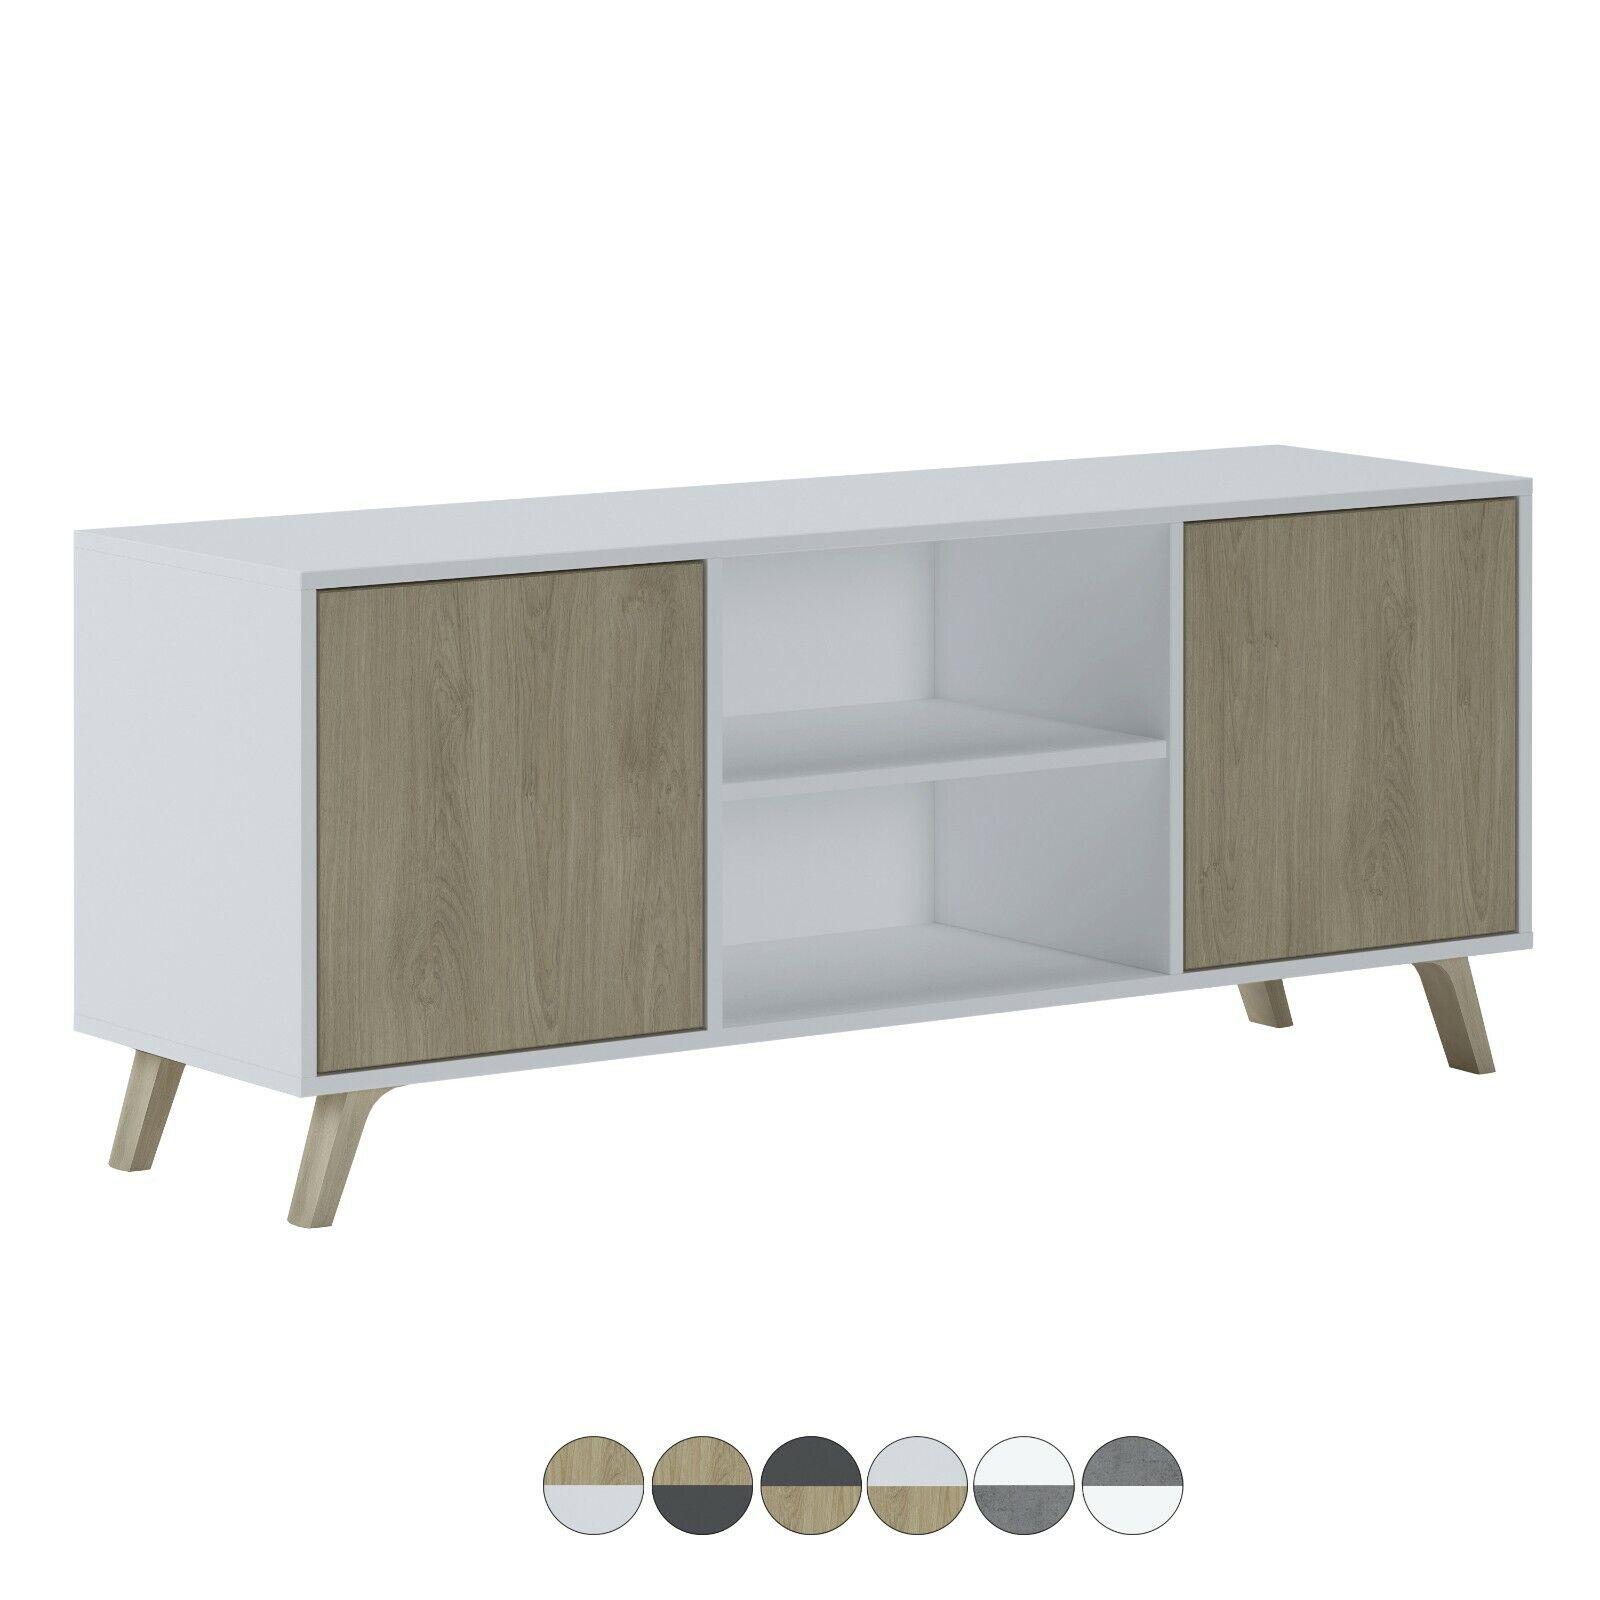 Mueble de comedor salon tv, mueble auxiliar multimedia, modulo para salón, Wind